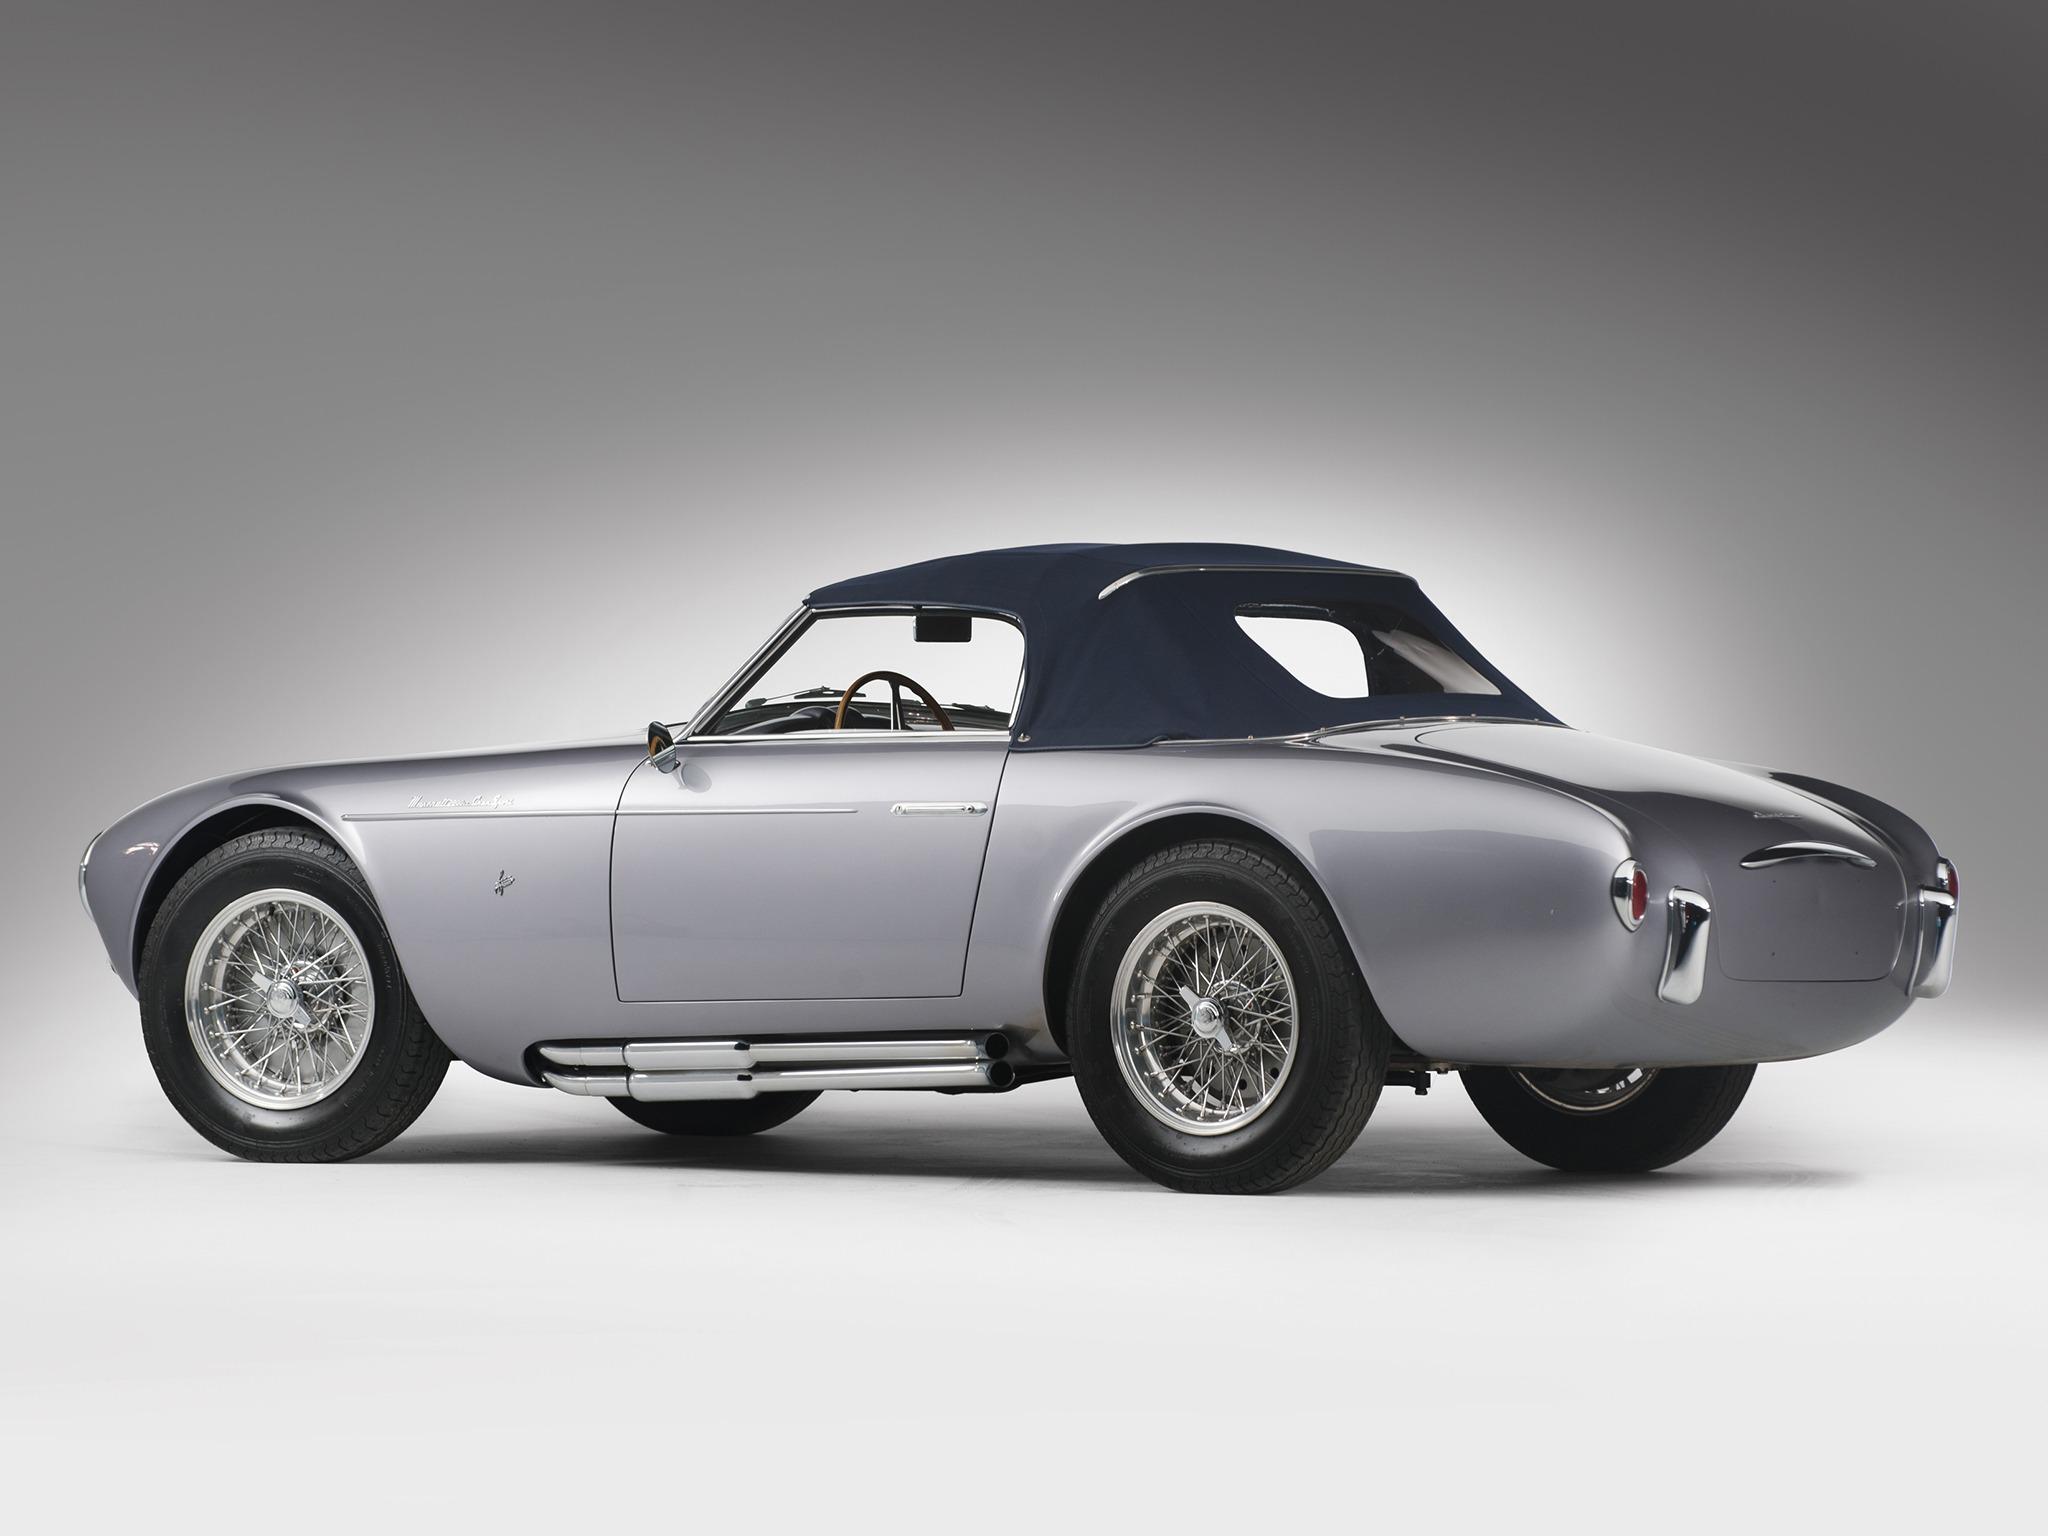 1956-Frua-Maserati-A6G-2000-Spyder-03